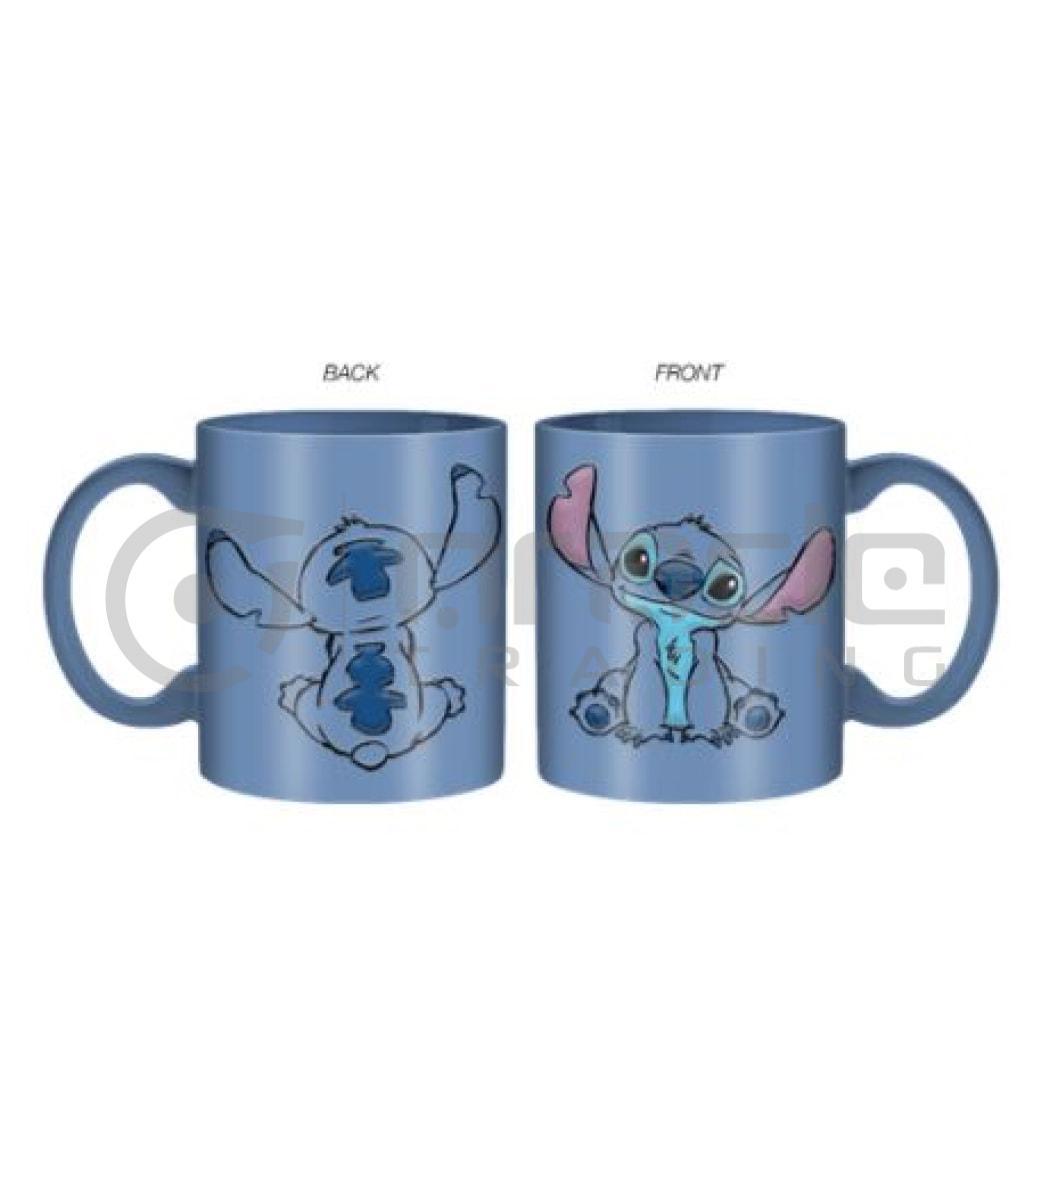 Lilo & Stitch Jumbo Mug - Wax Resistant